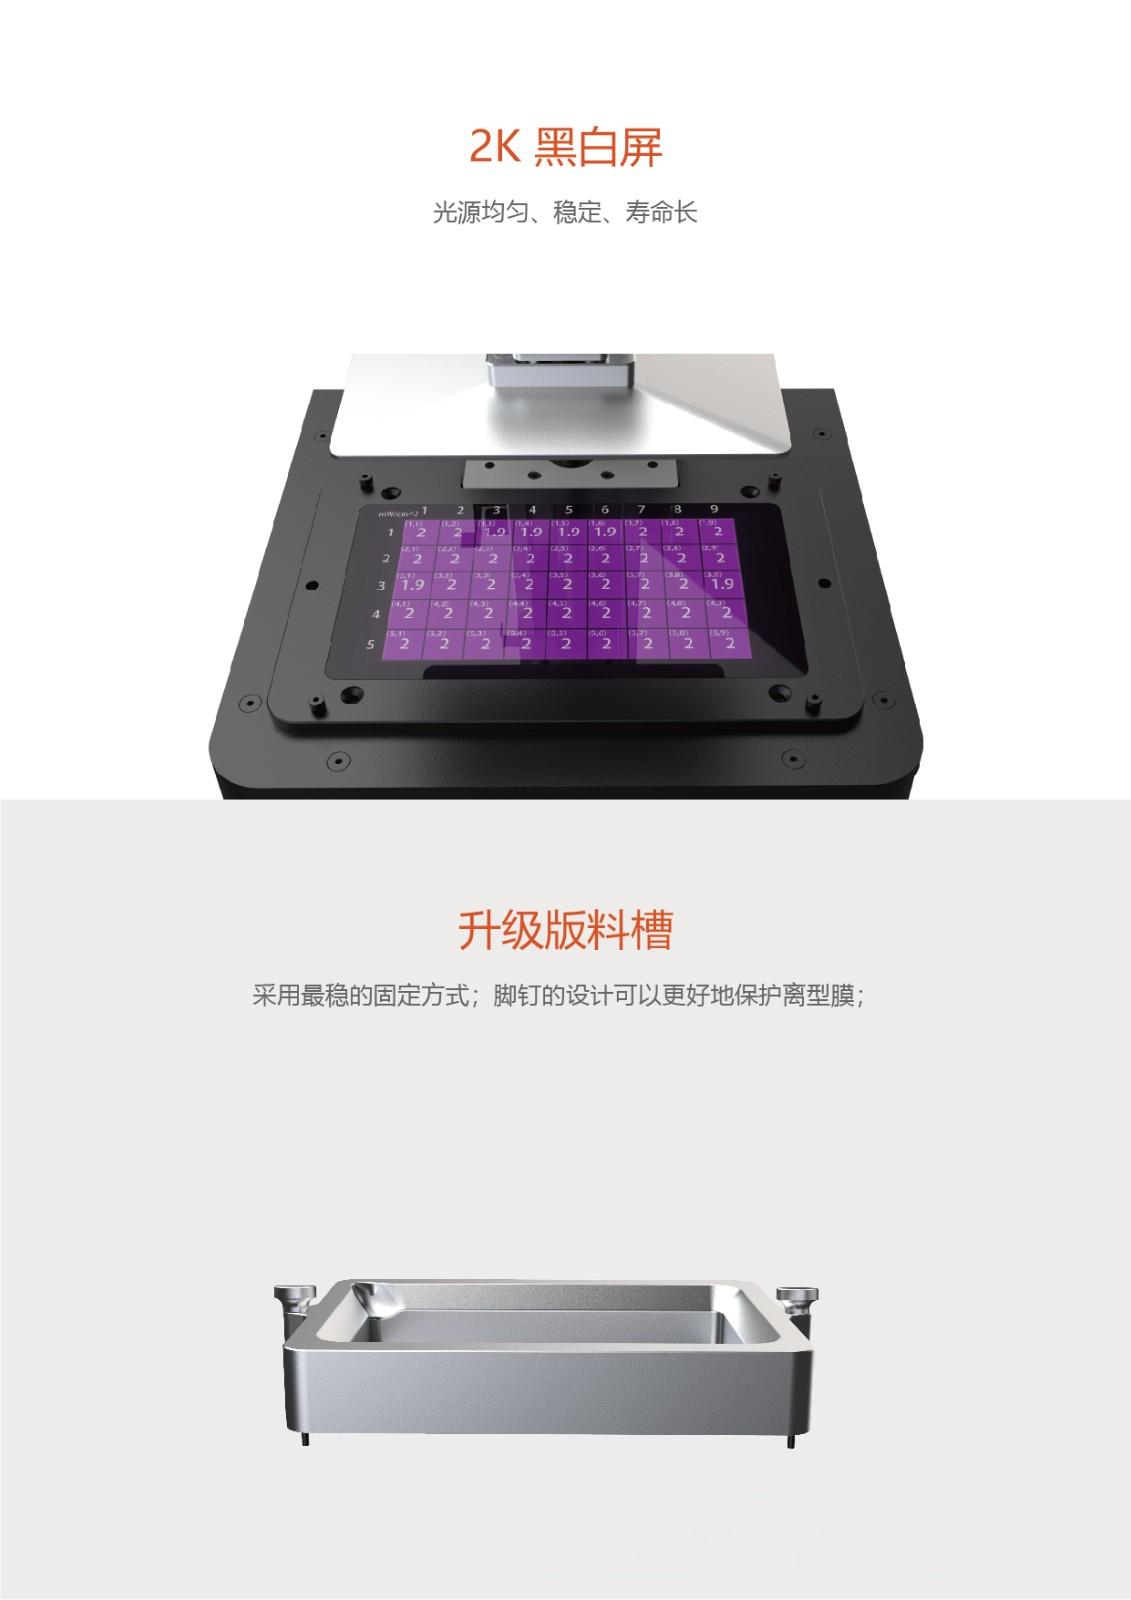 SCRAT3D 黑白屏高精度光敏树脂 LCD 桌面级光固化 3D 打印机 S-ONE 发售